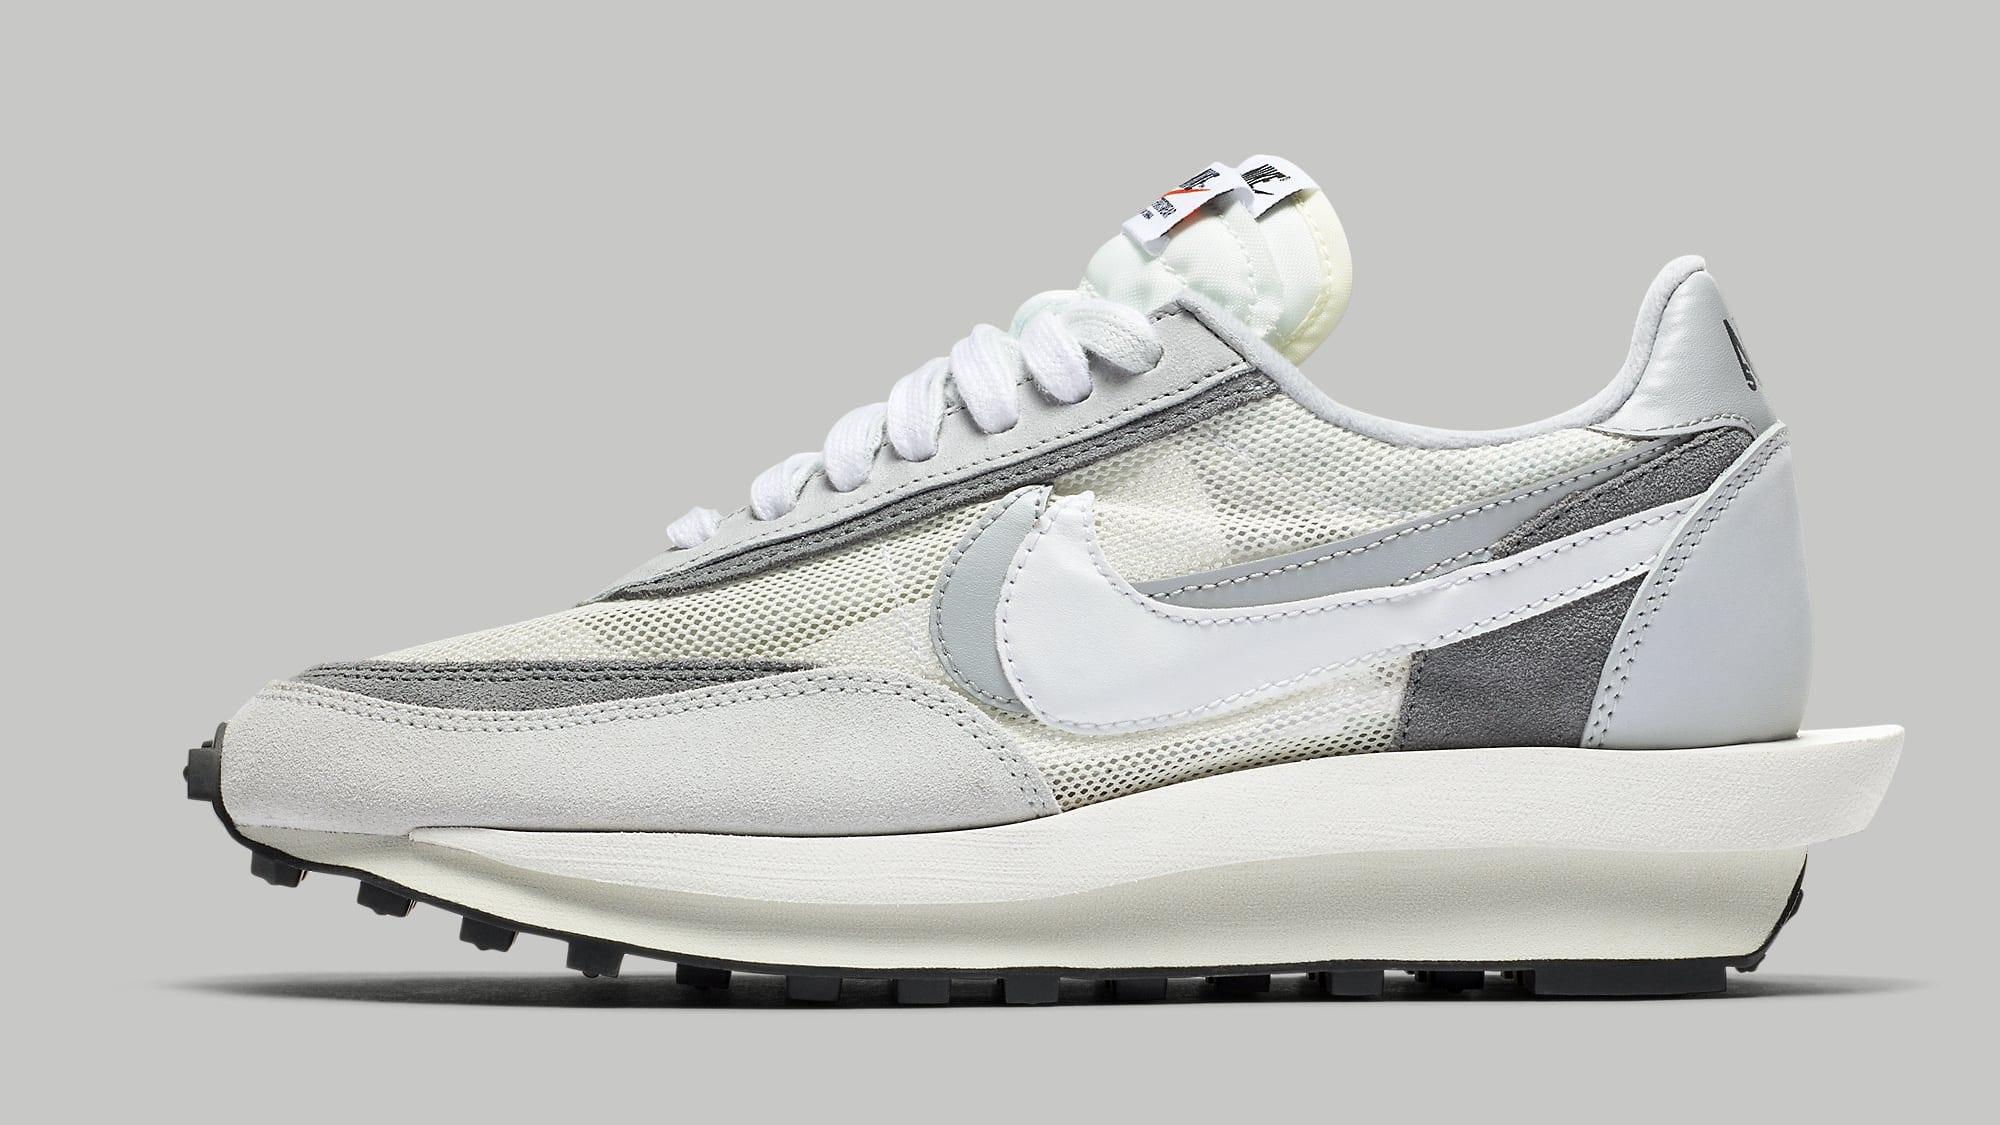 Sacai Nike LDWaffle Summit White Wolf Grey Release Date BV0073-100 Profile